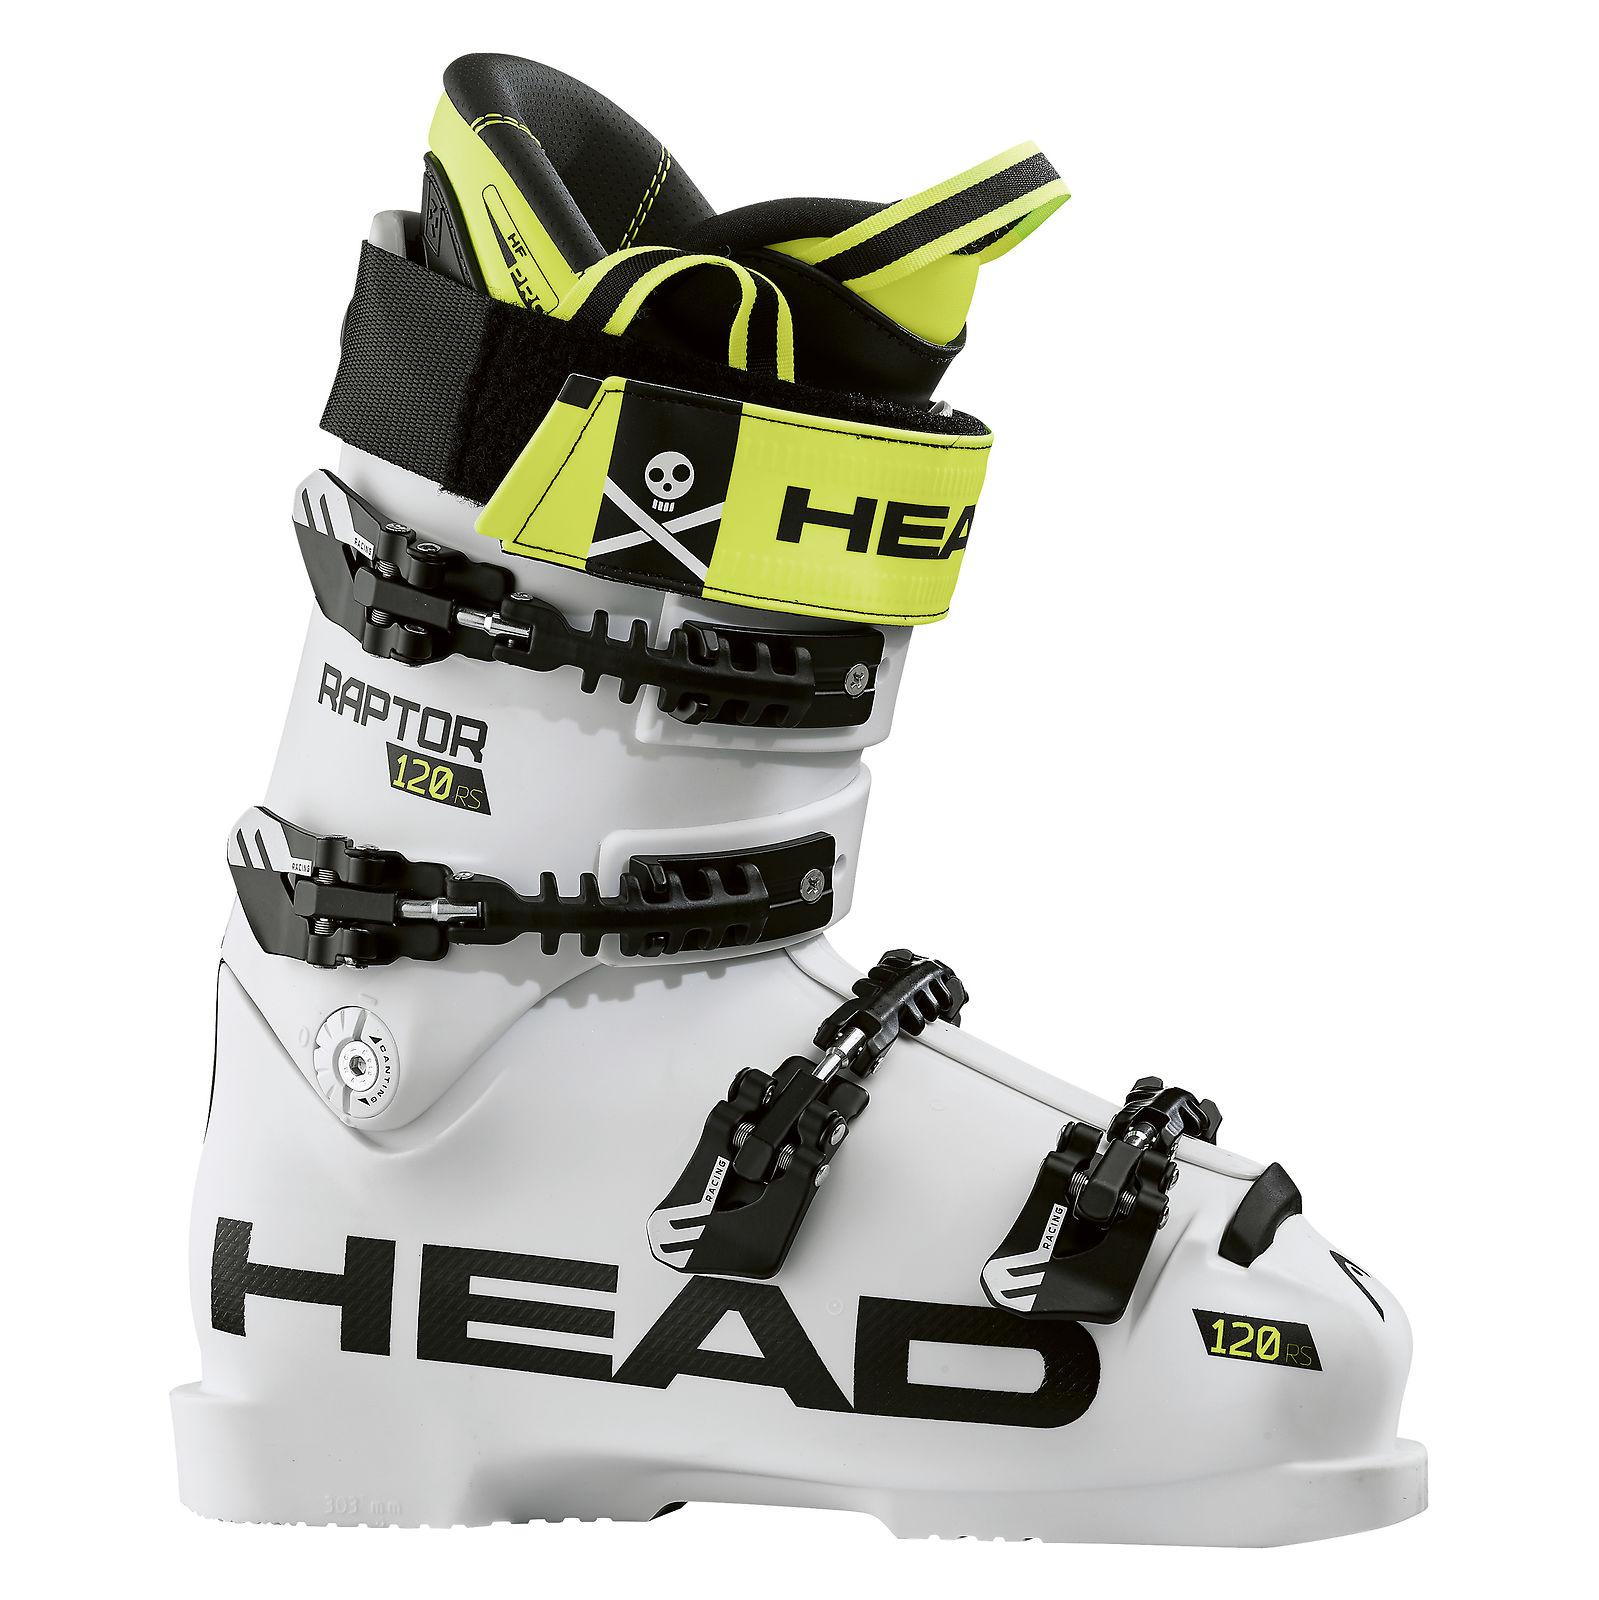 Buty narciarskie męskie Head Raptor 120S RS 609021